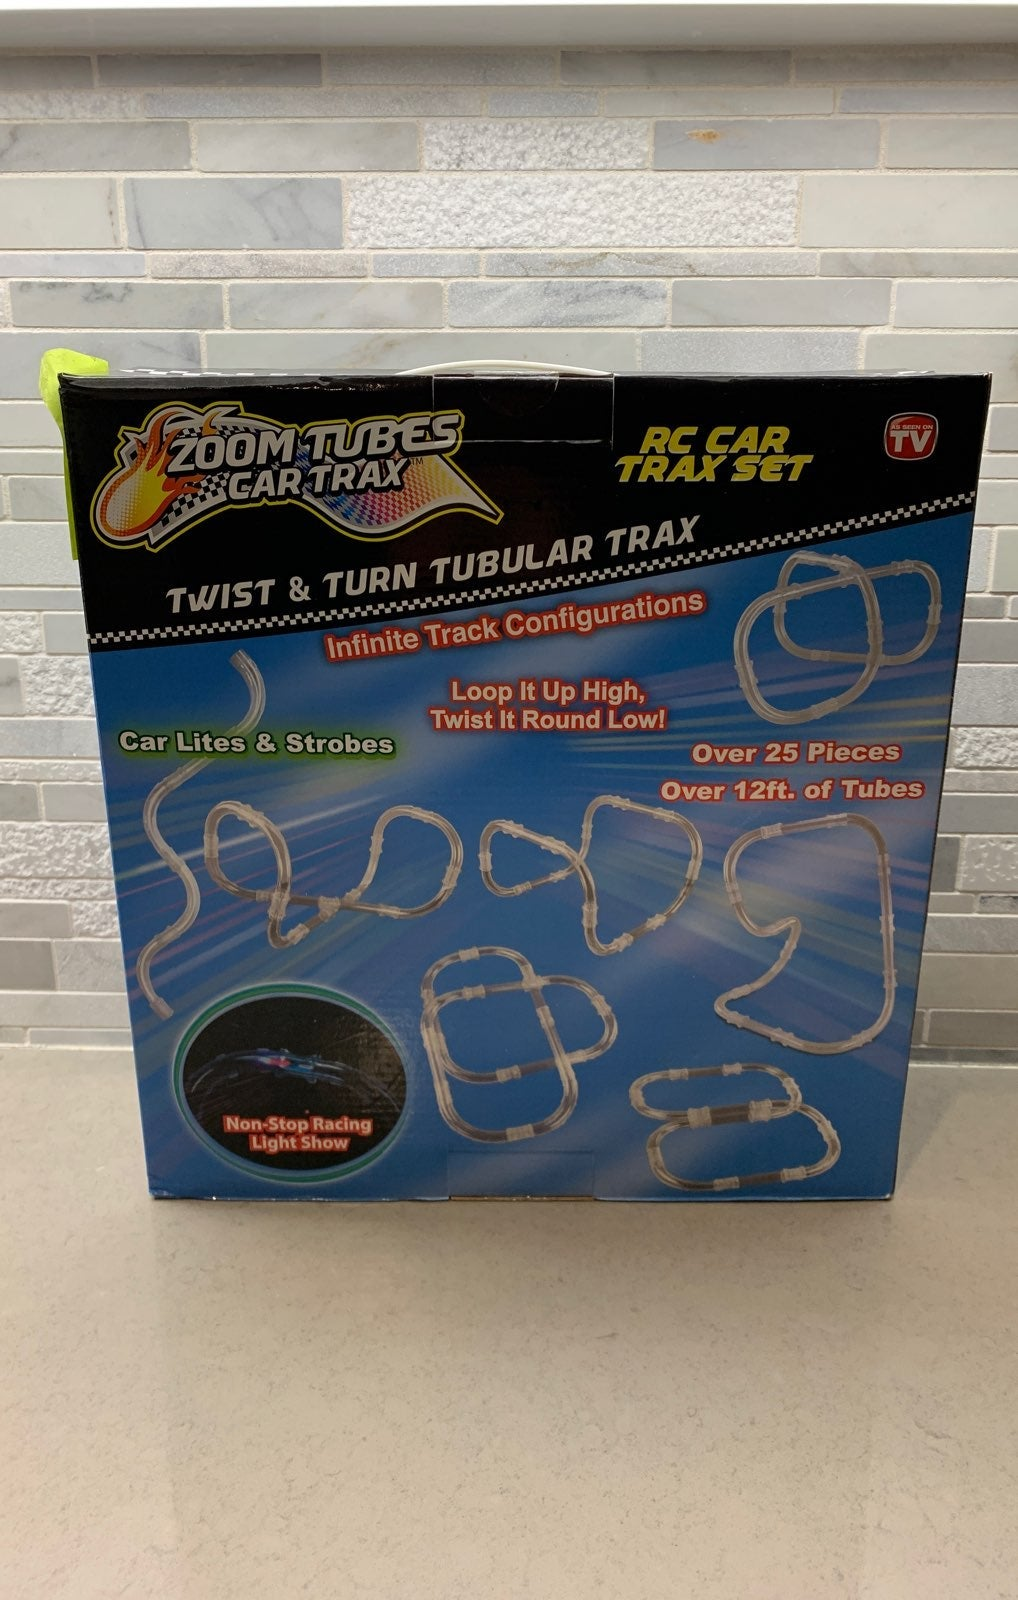 New zoom tubes car trax RC car trax set